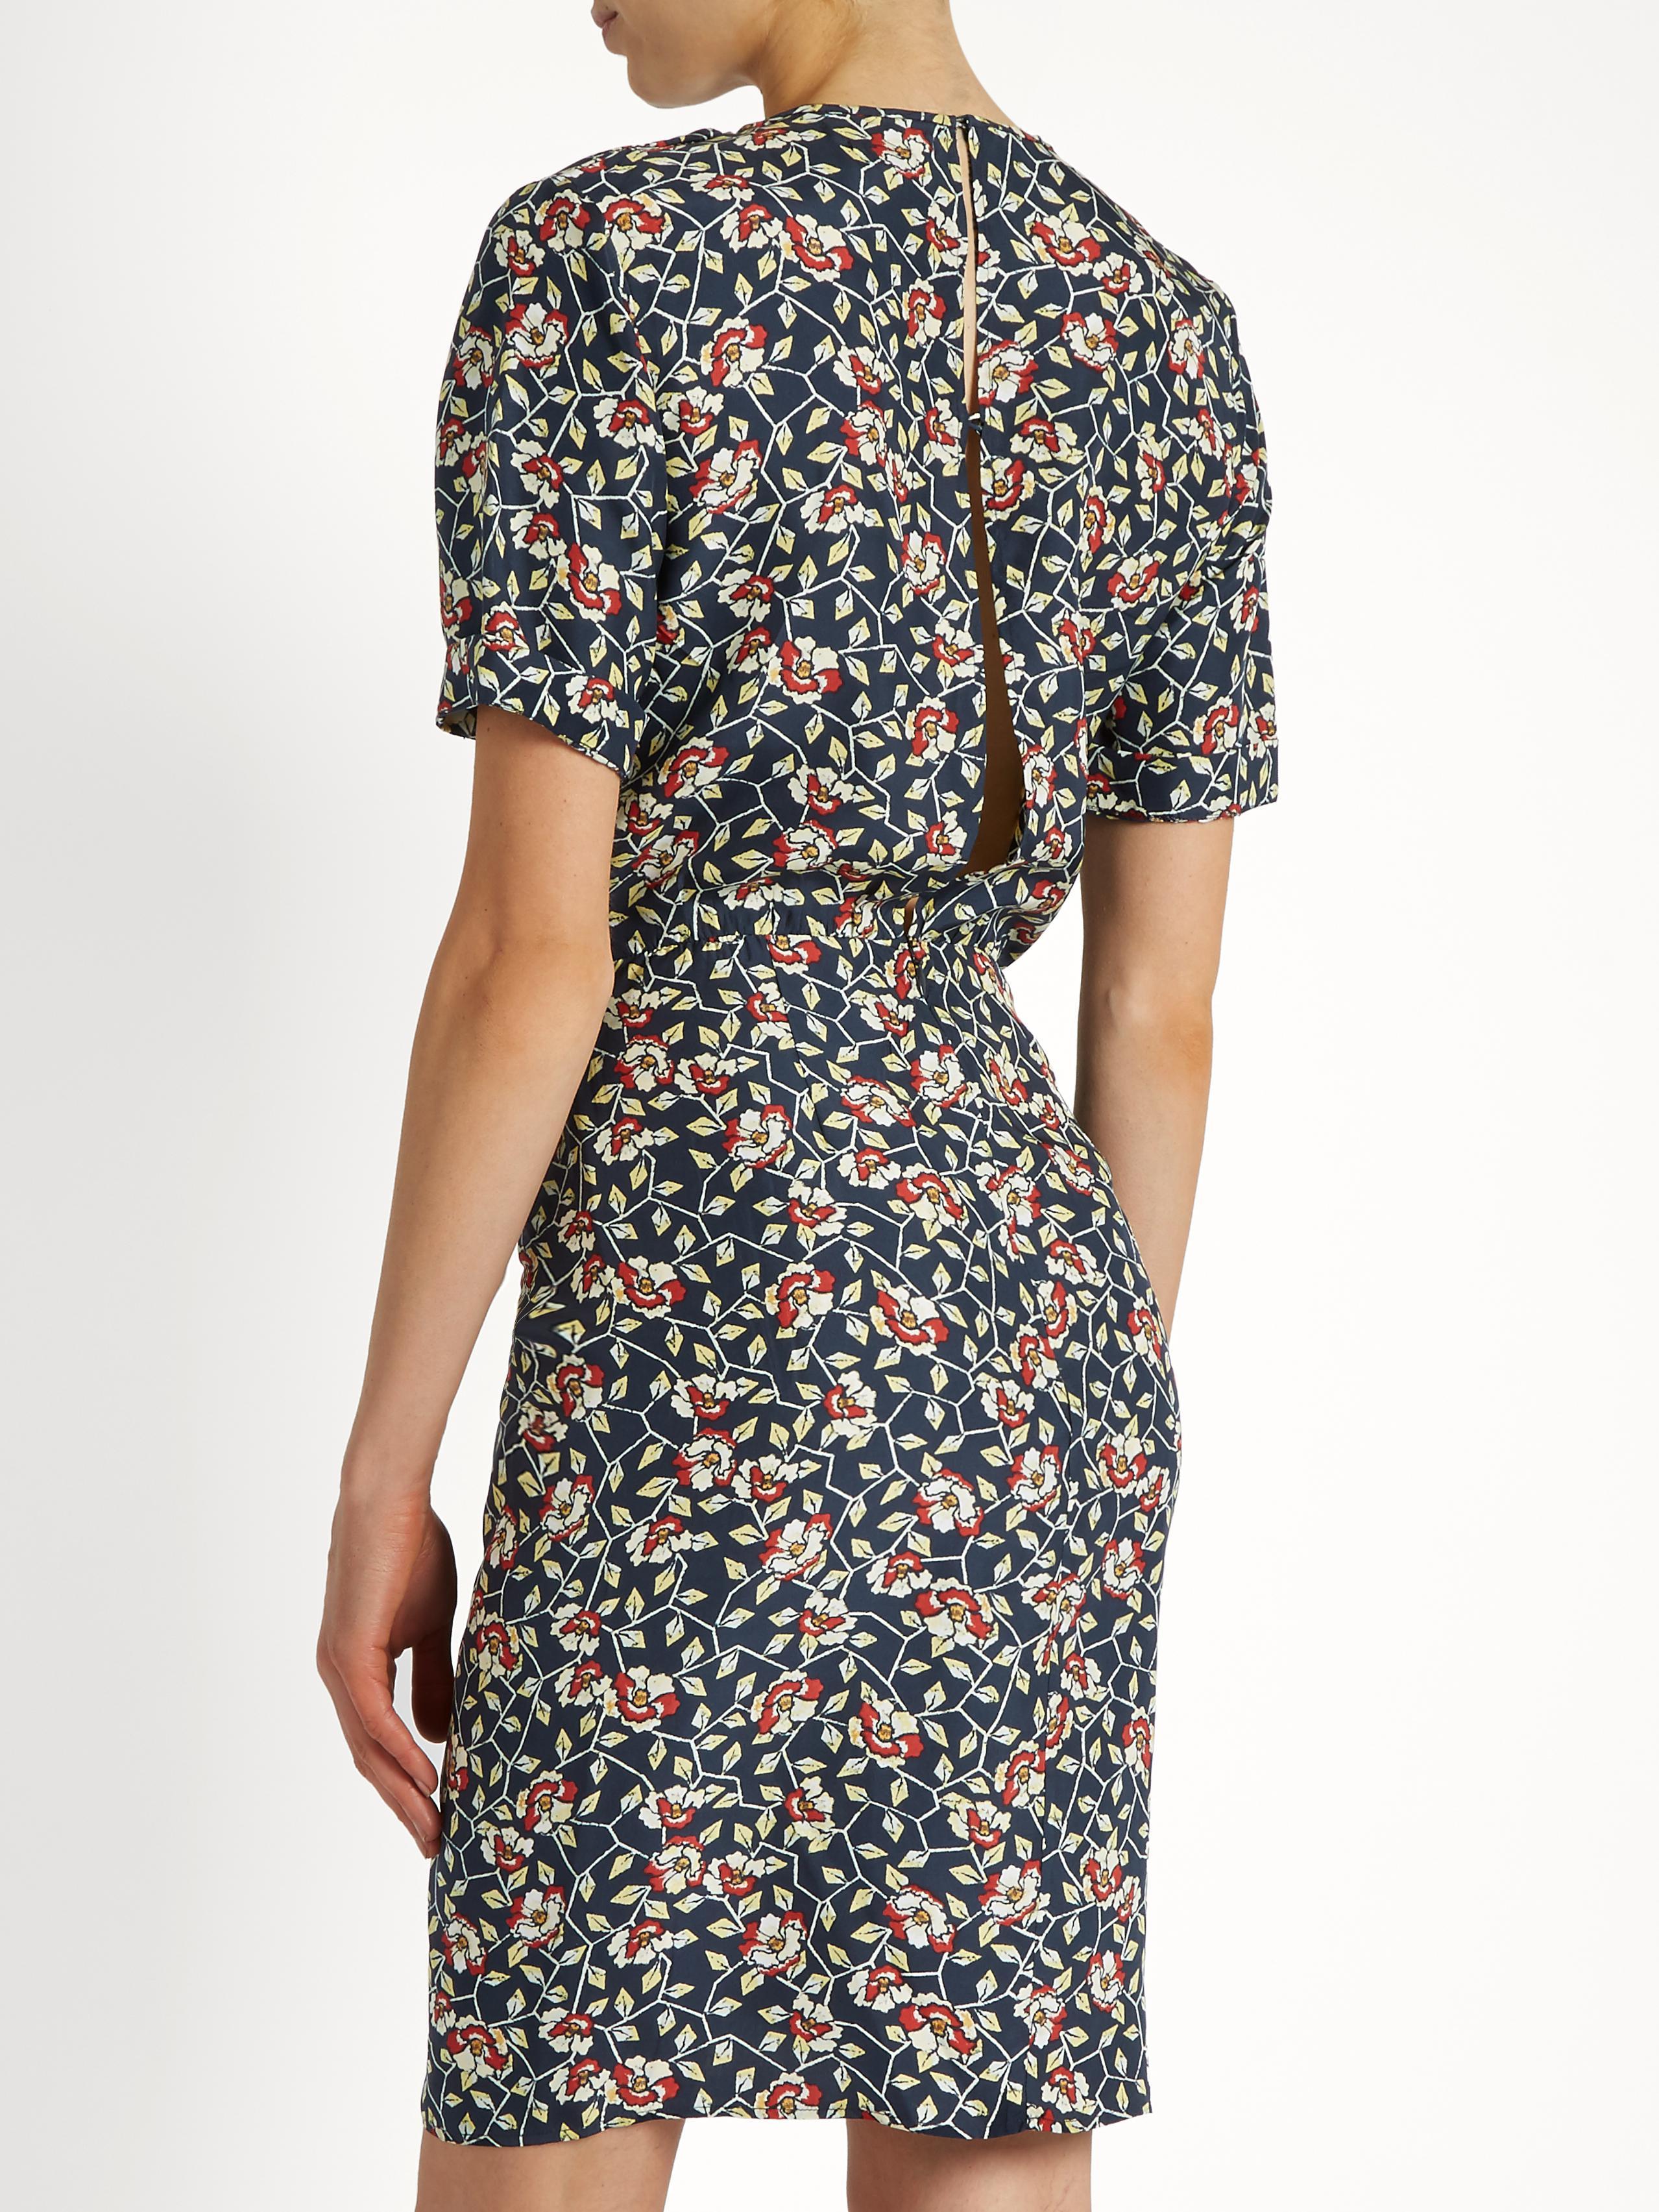 28f8a1b5052 Isabel Marant Rehora Floral-print Silk-habotai Dress in Black - Lyst